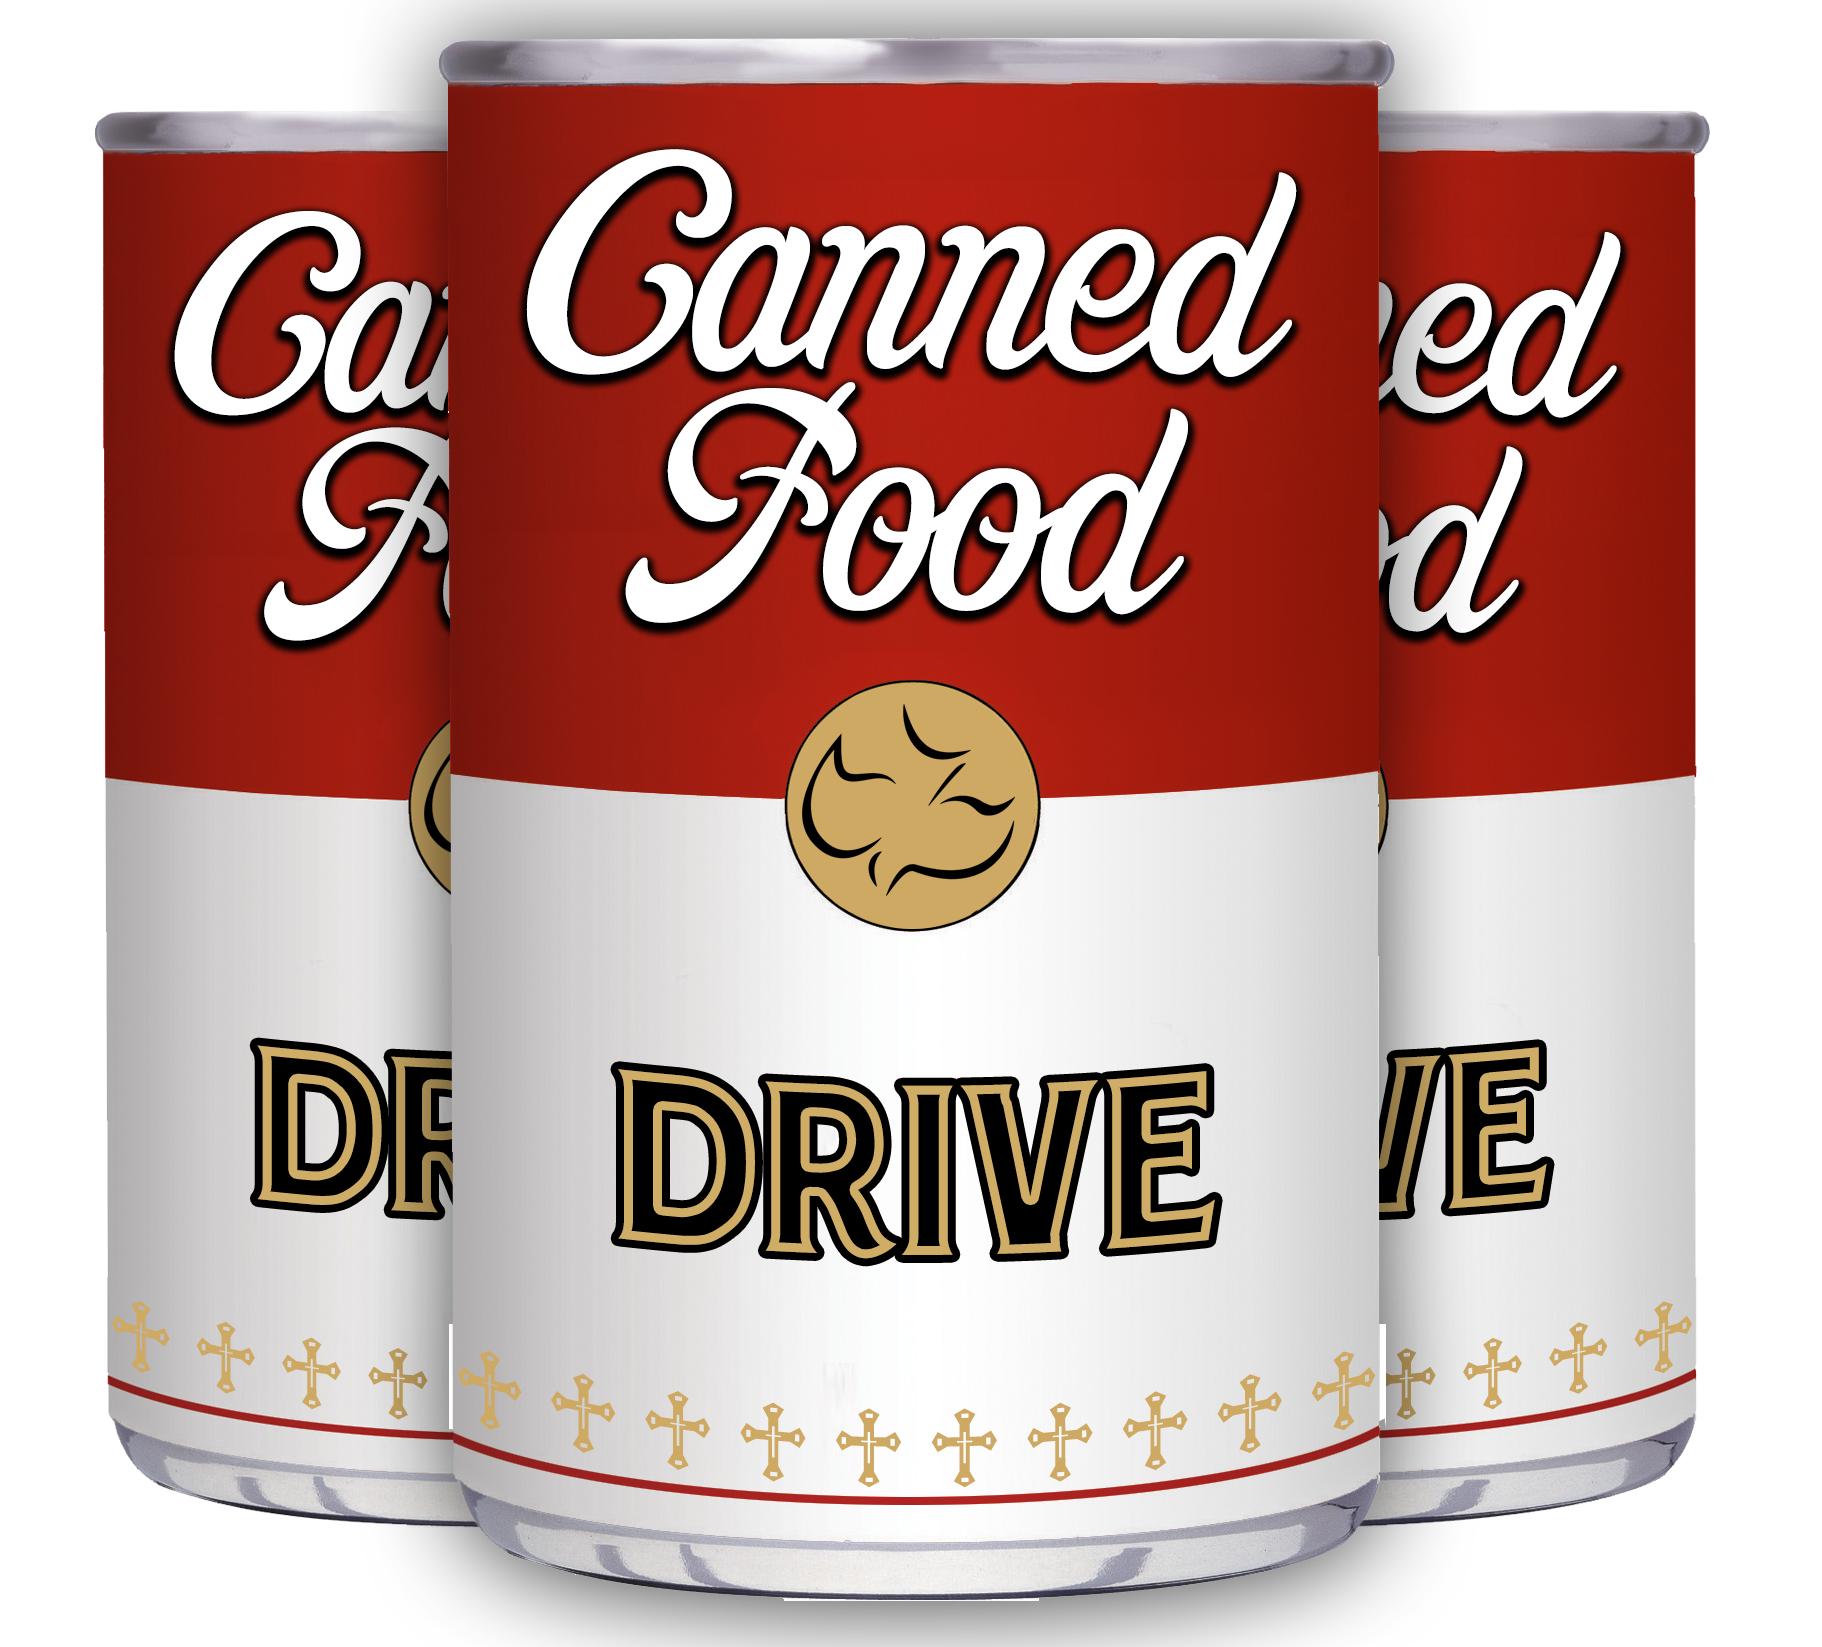 canned food drive bristow montessori school